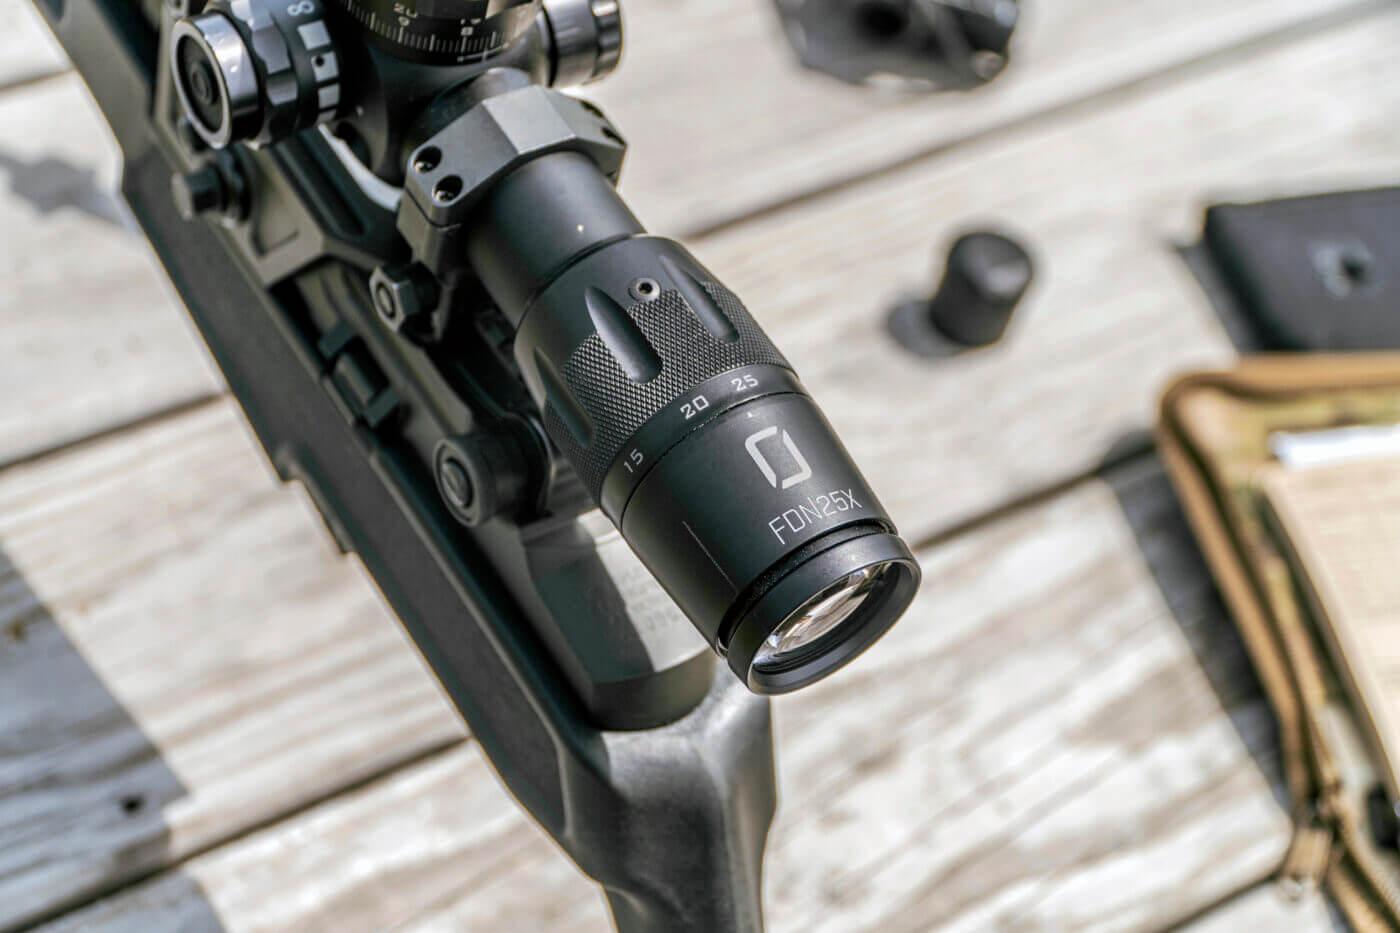 FDN 25X scope by US Optics